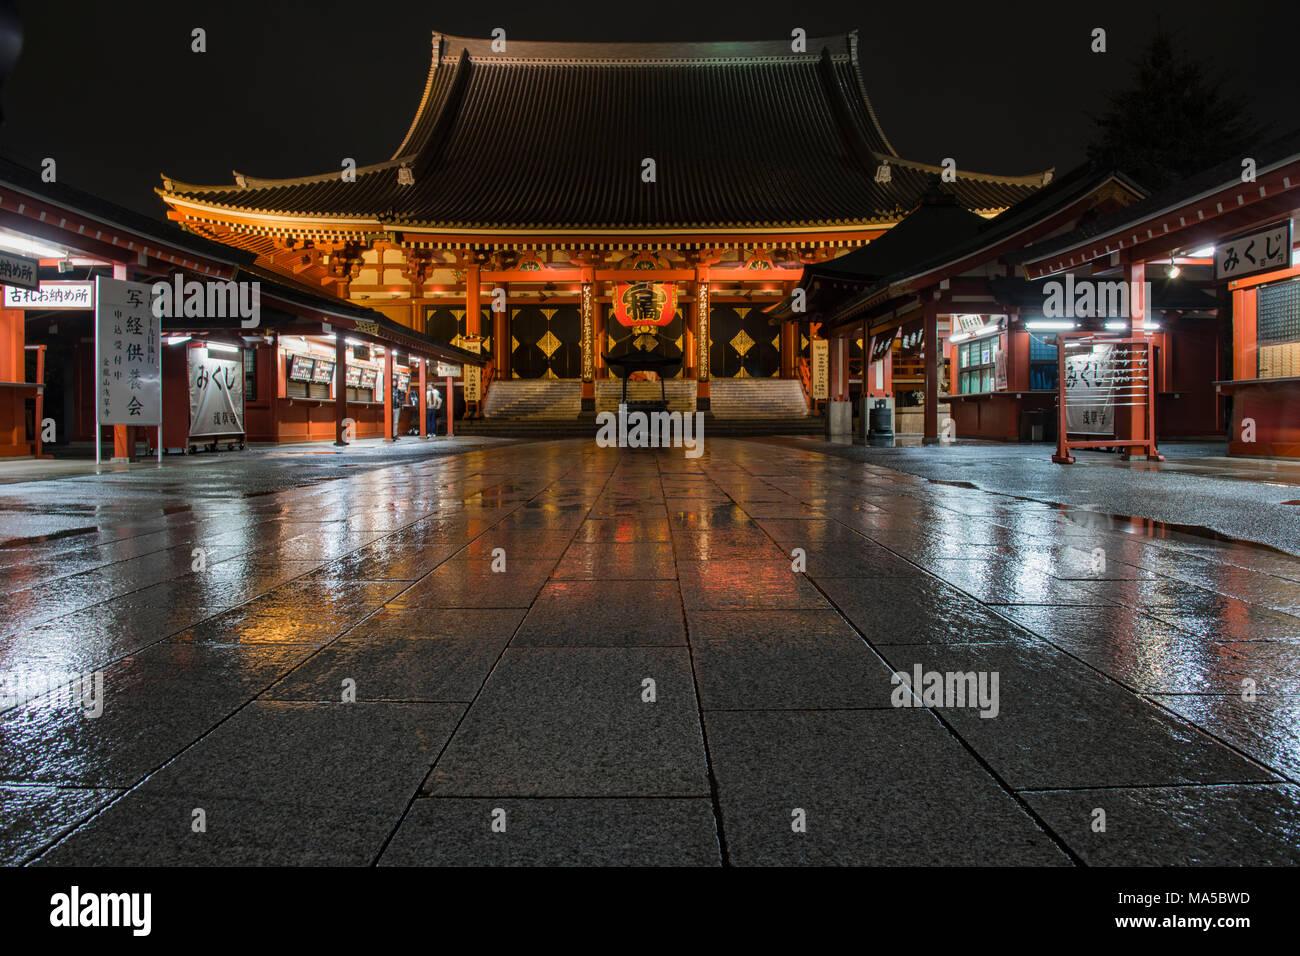 Asia, Giappone, Nihon, Nippon, Tokyo, Taito, Asakusa, Sens?-ji di notte Foto Stock